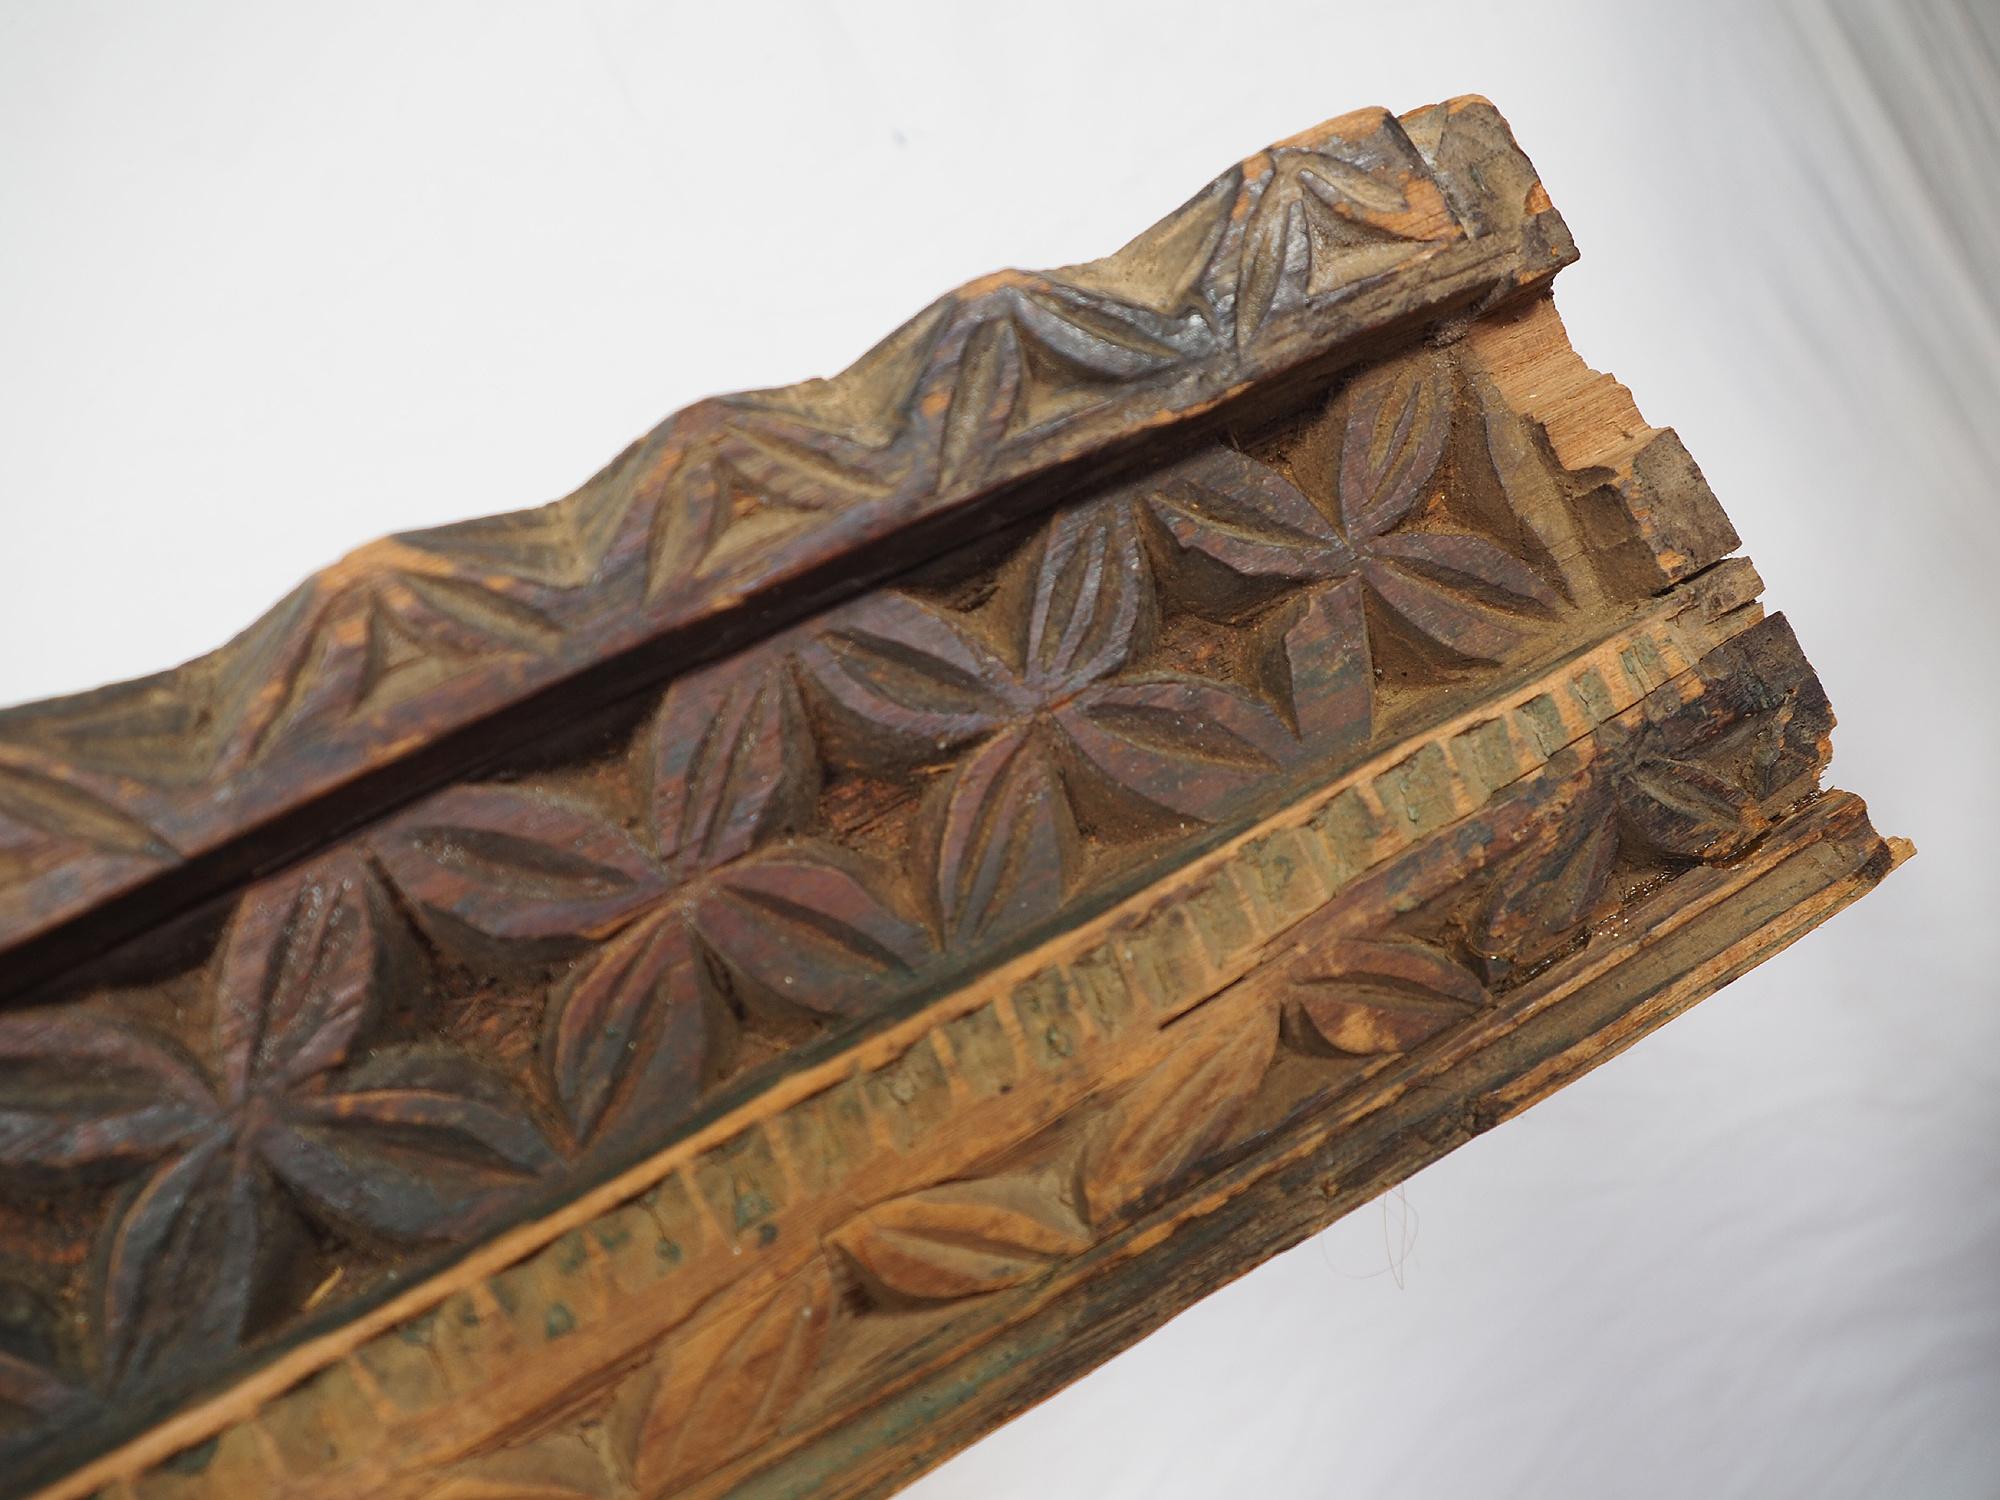 115 cm x 11 cm antik orient handgeschnitzte Massiv Holz Afghanistan Nuristan Panel Pakistan Swat-Valley 18/19 Jh. Nr:20/A